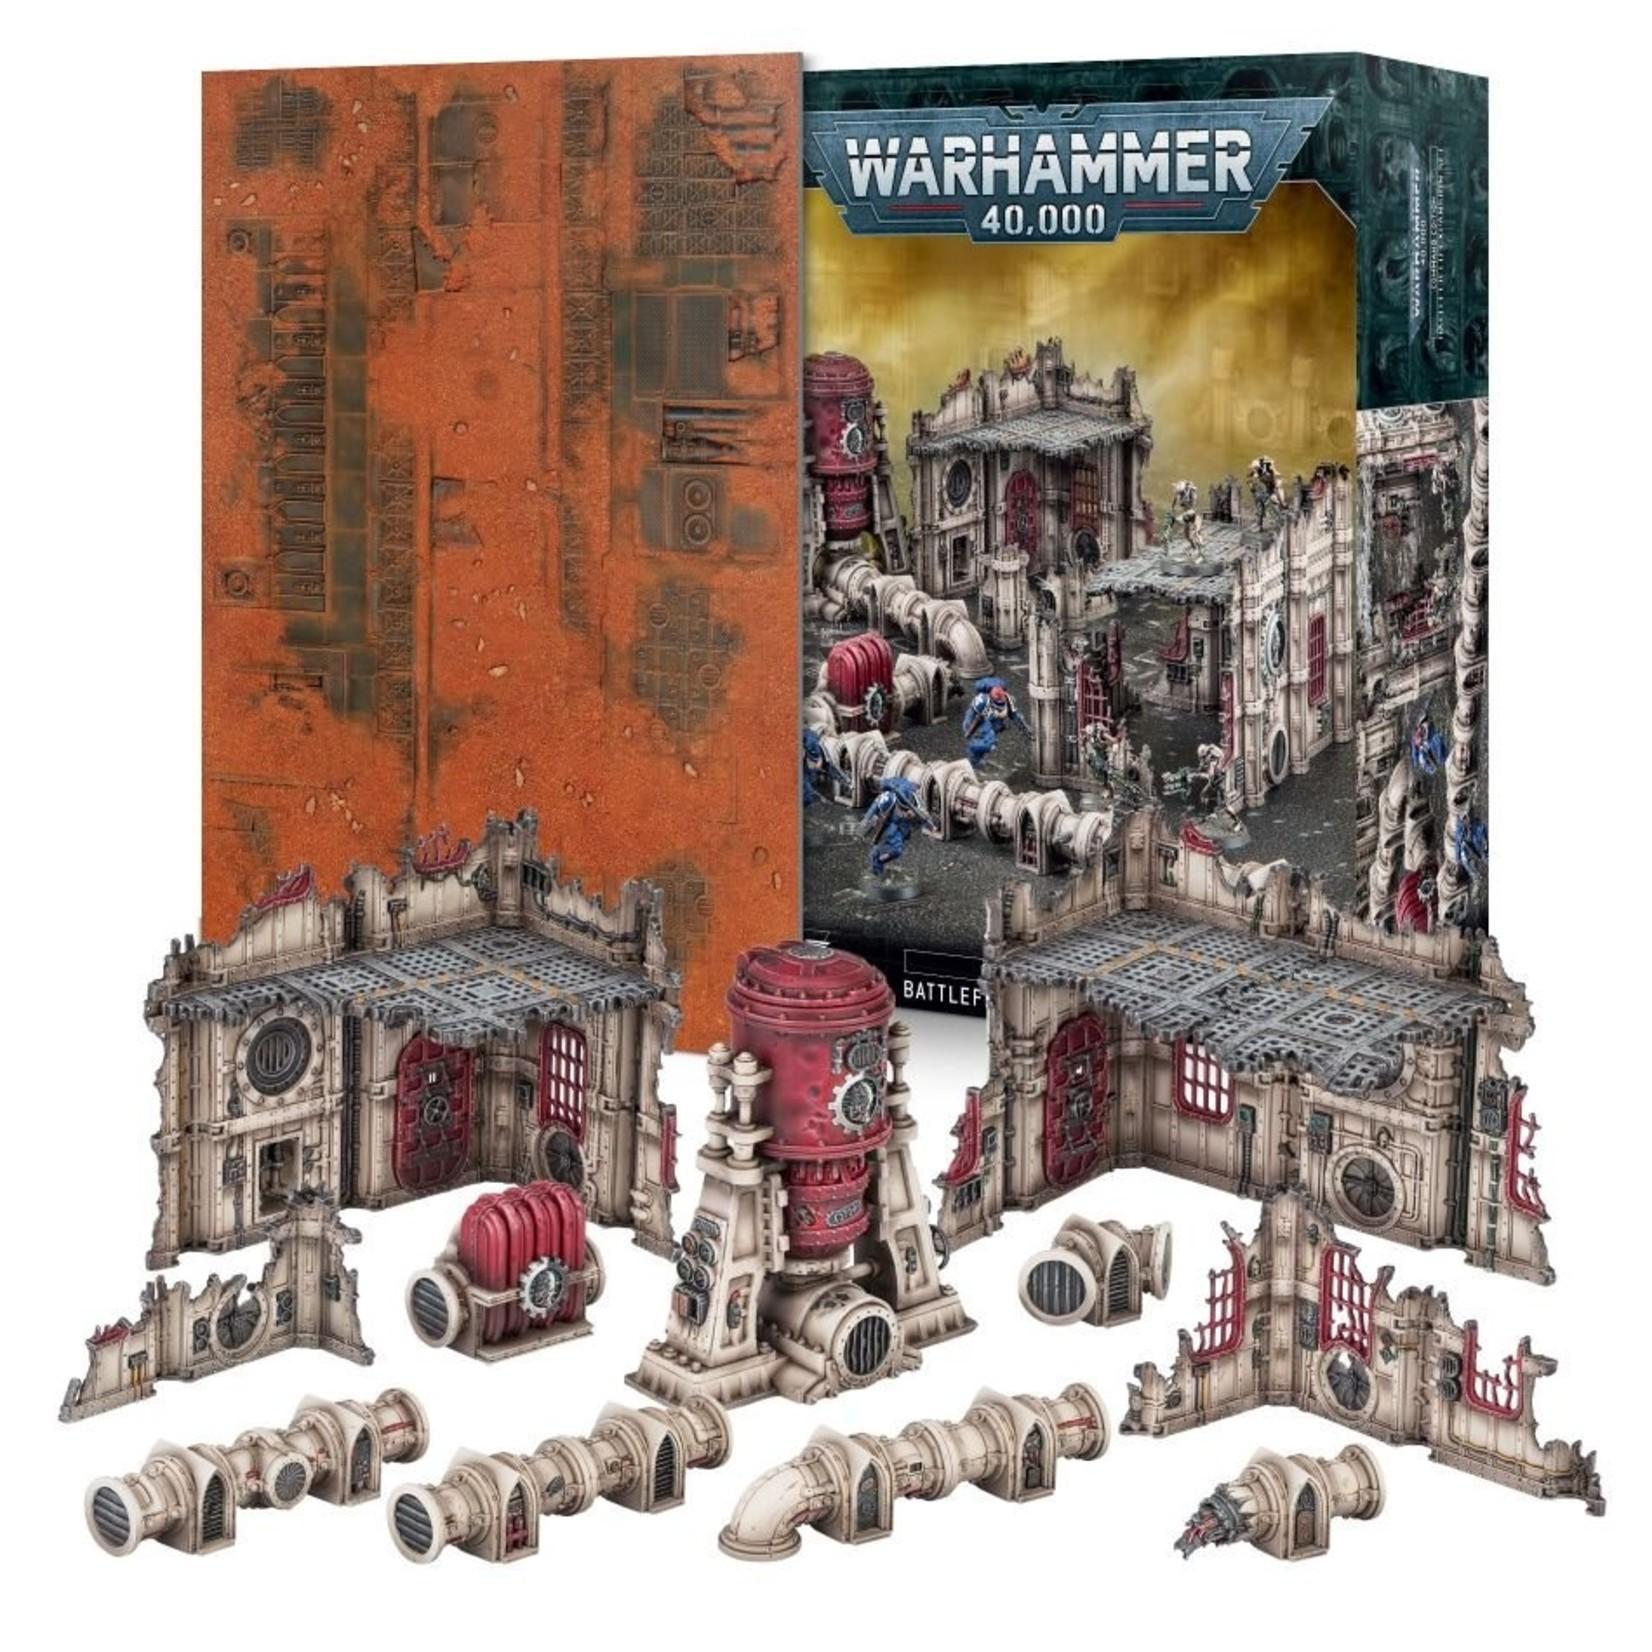 Games Workshop Warhammer 40,000 Command Edition Battlefield Expansion Set